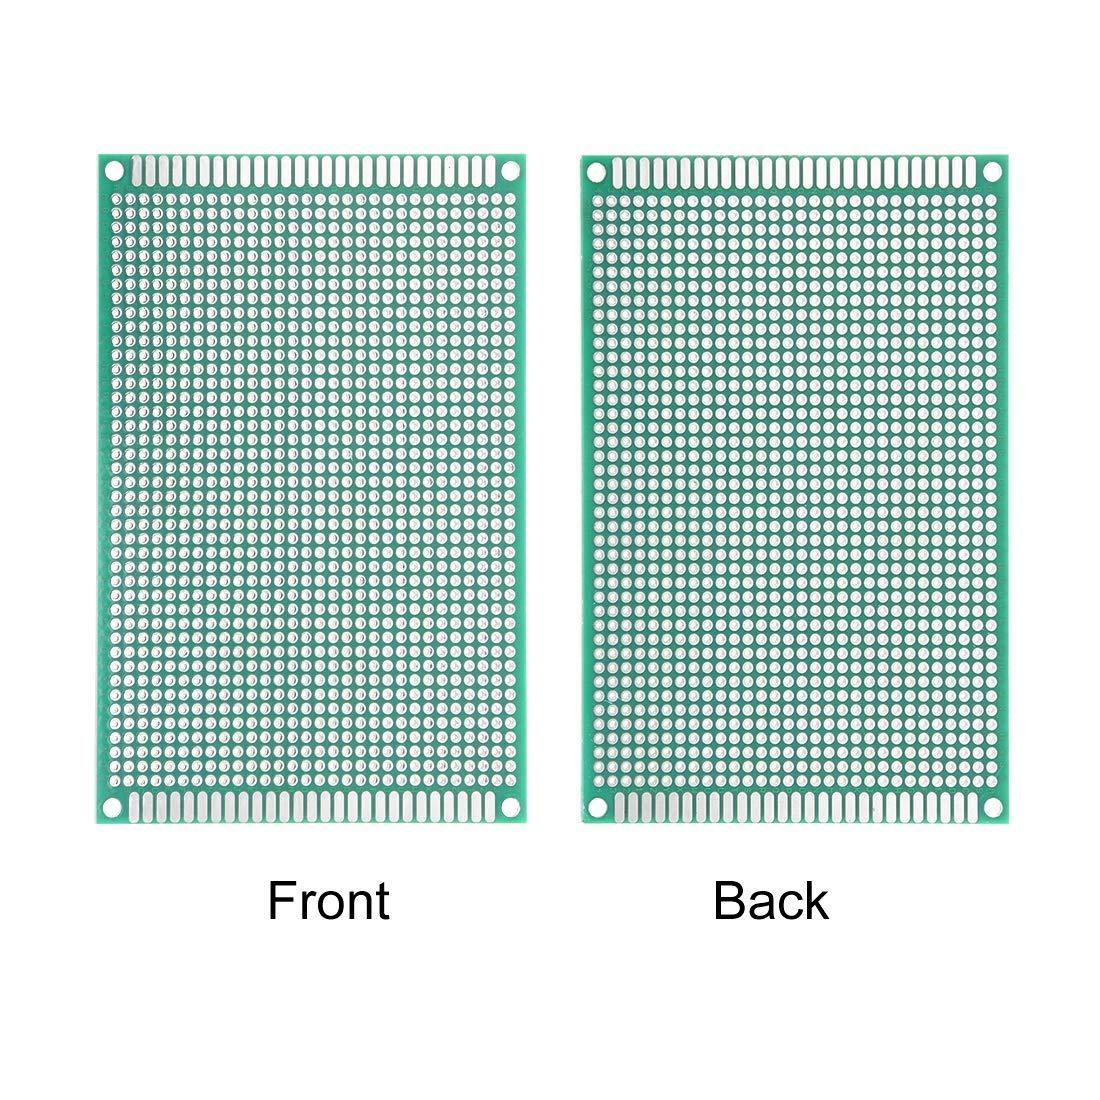 Placa de circuito impreso universal de doble cara Sourcingmap 8 x 12 cm, para soldar, 10 unidades